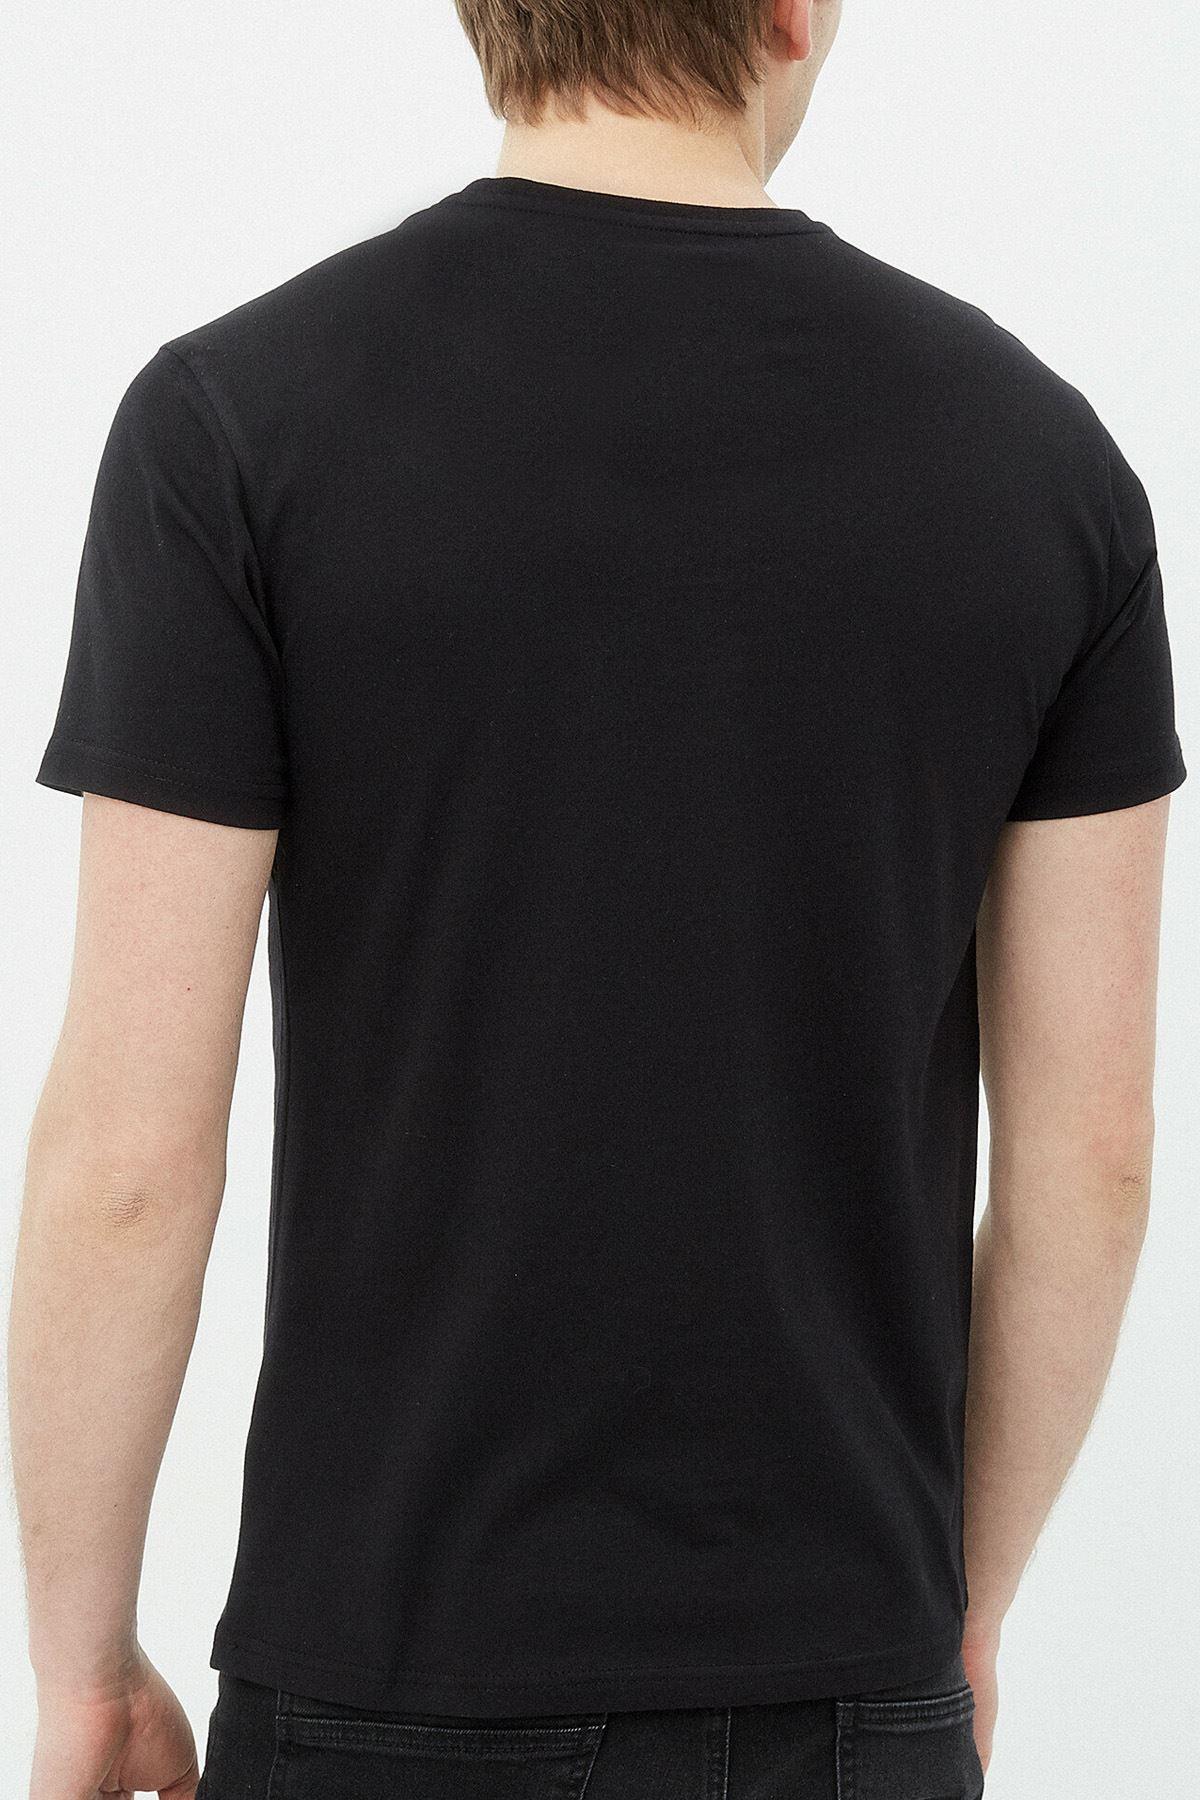 Anime Bebop 04 Siyah Erkek Tshirt - Tişört